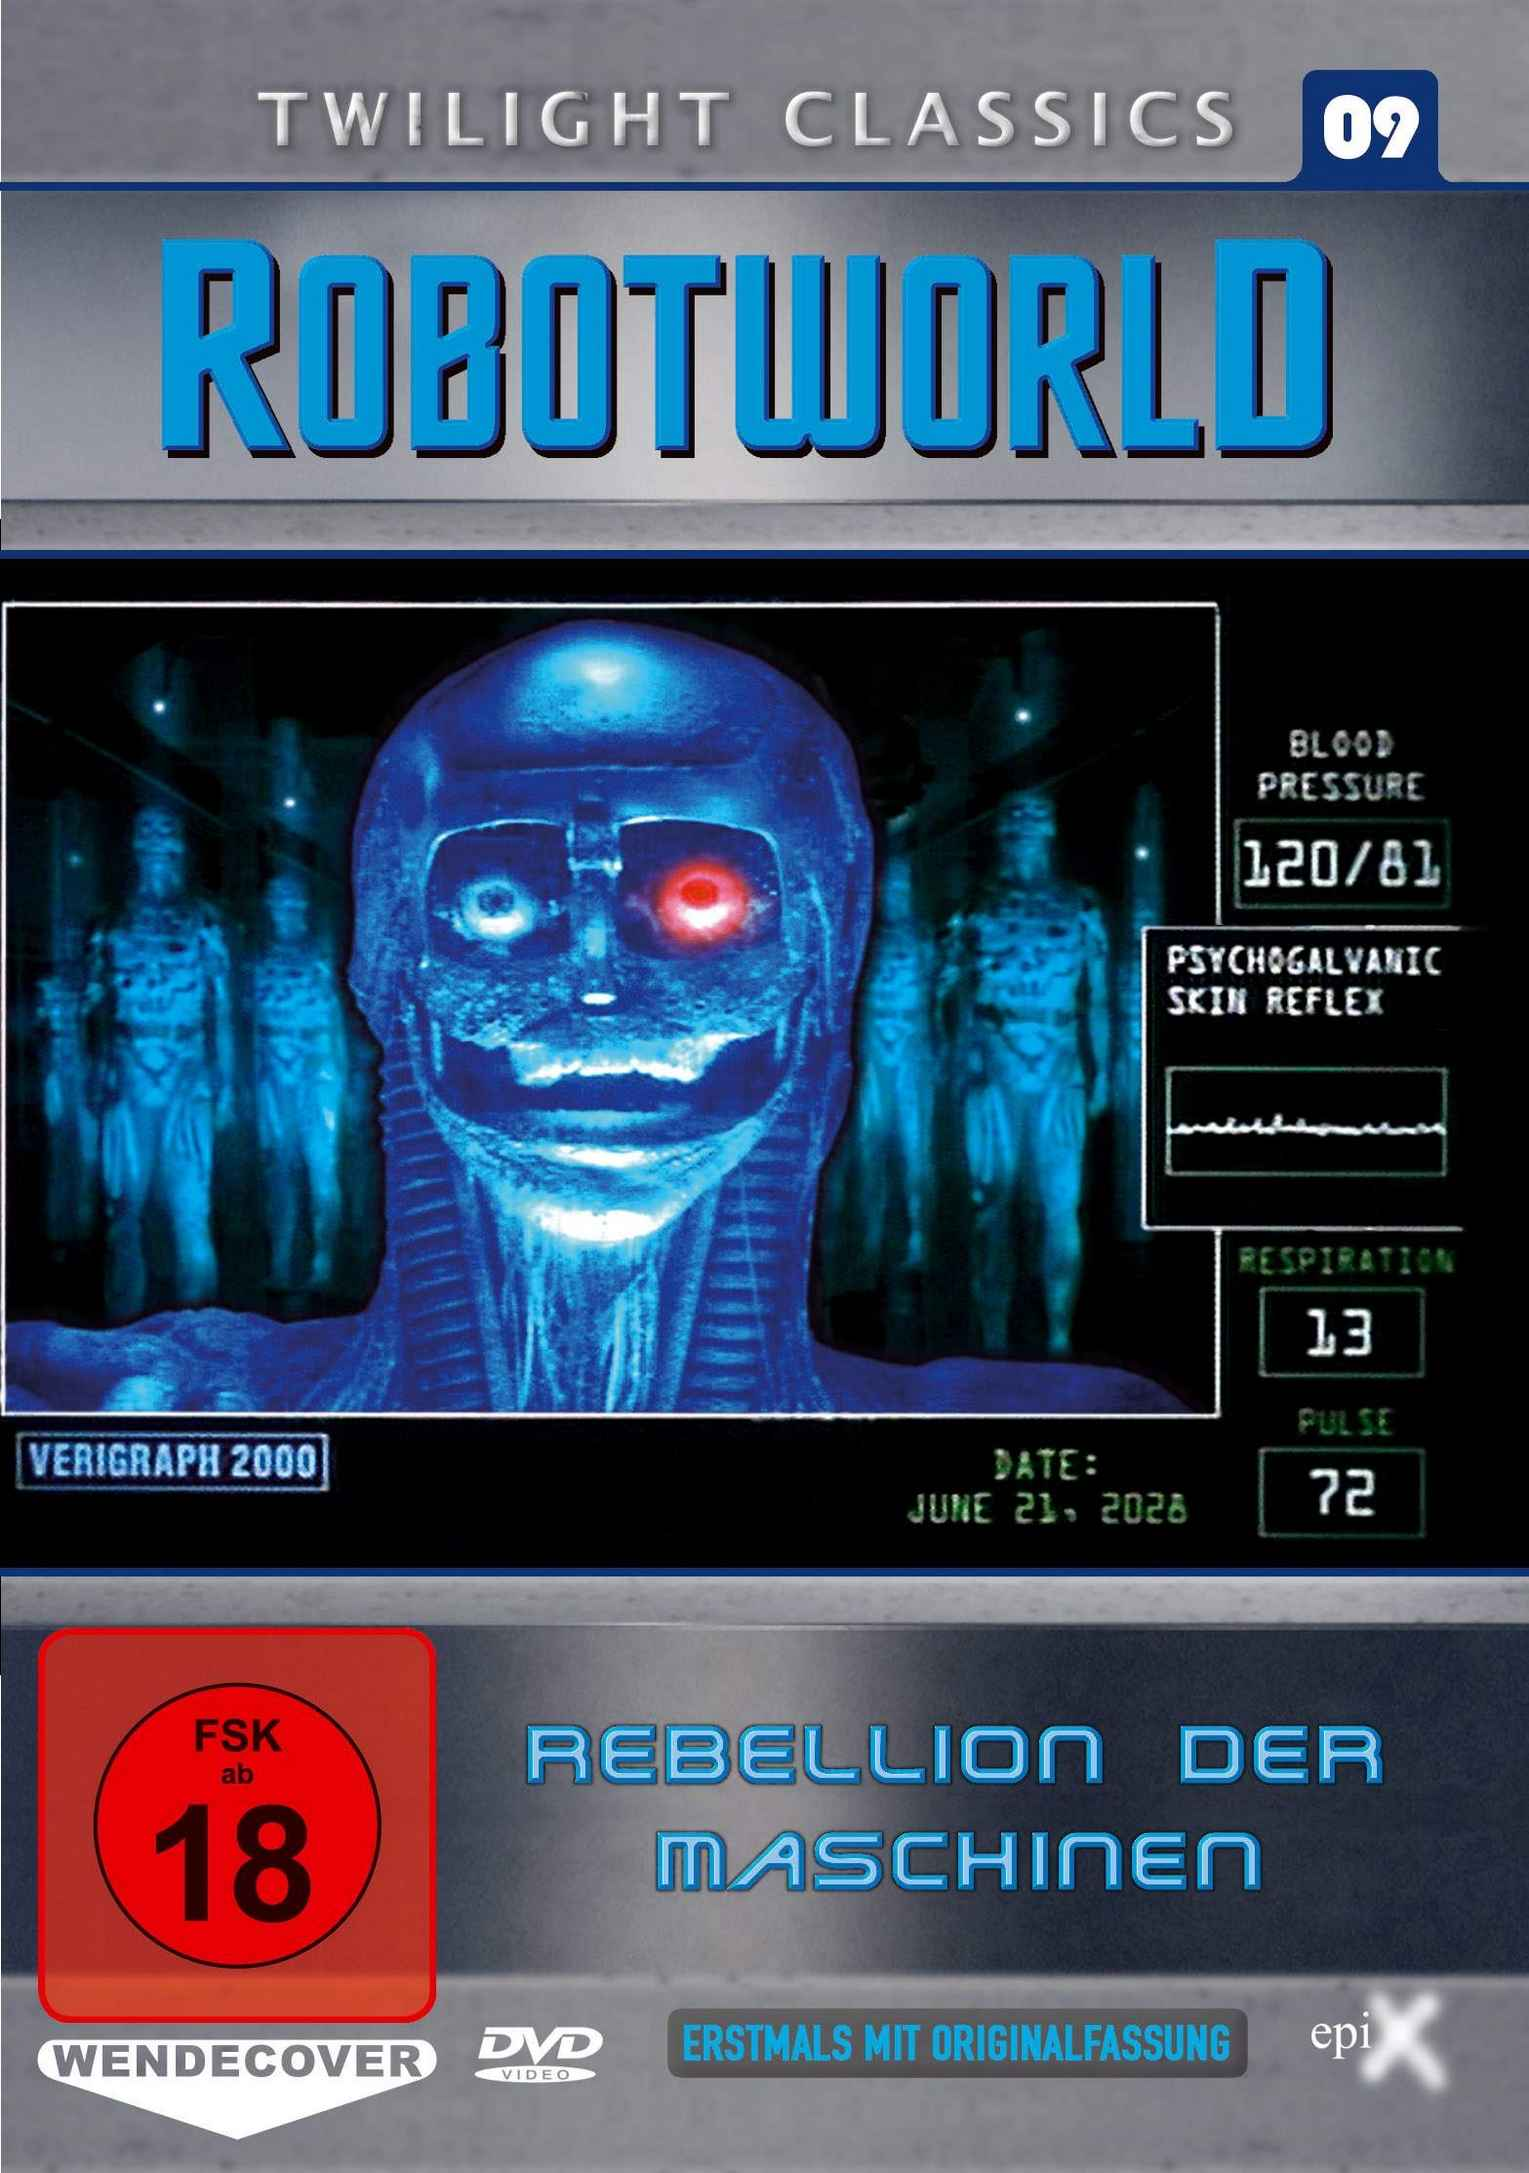 robot world front fsk ohne dl mit neu FSK